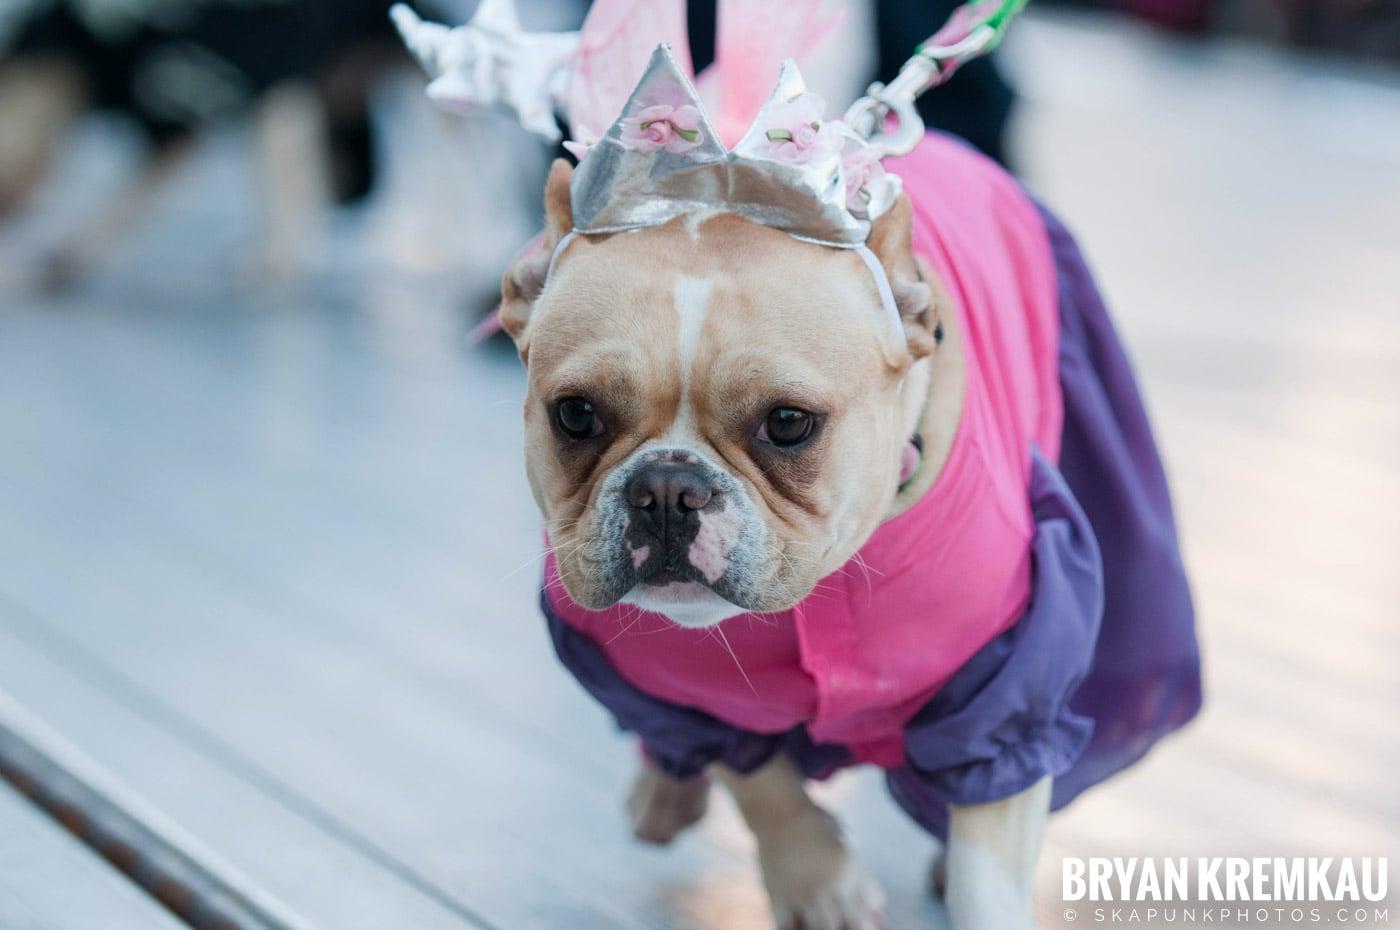 Paulus Hook Halloween Pet Parade 2011 @ Jersey City, NJ - 10.30.11 (14)